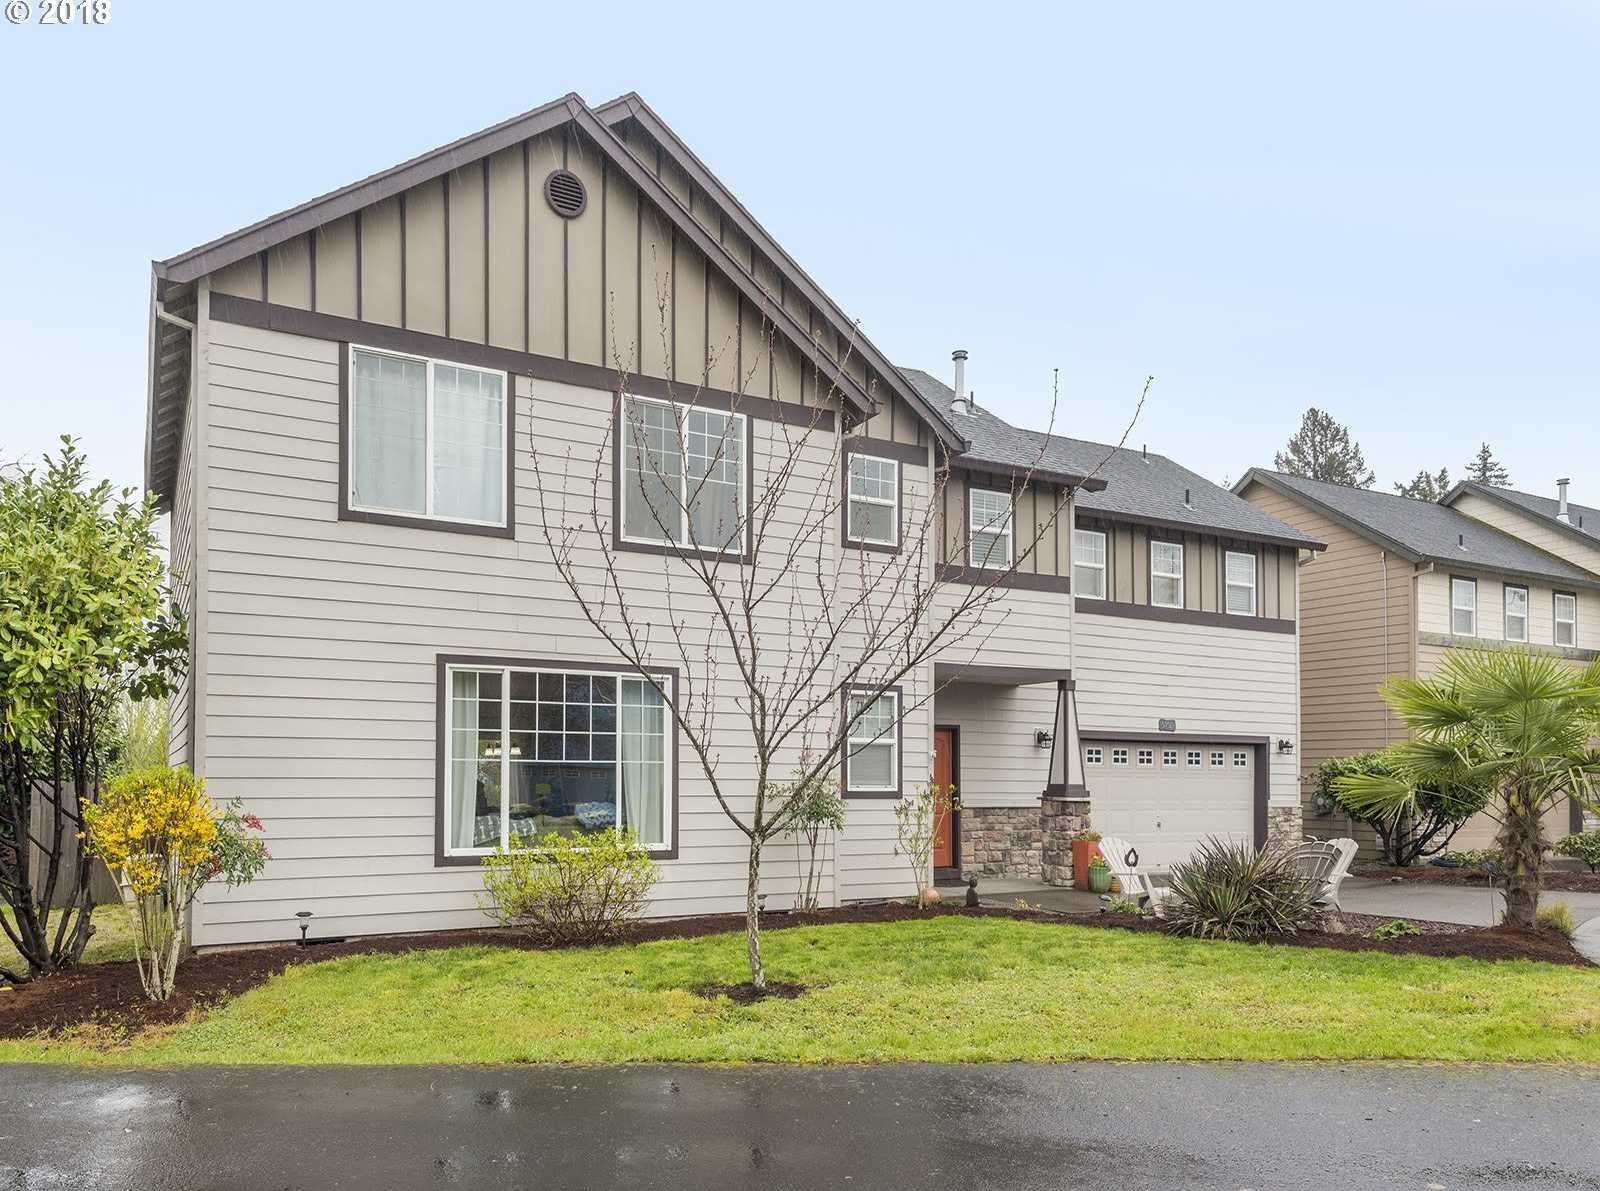 $499,000 - 5Br/3Ba -  for Sale in Beaverton